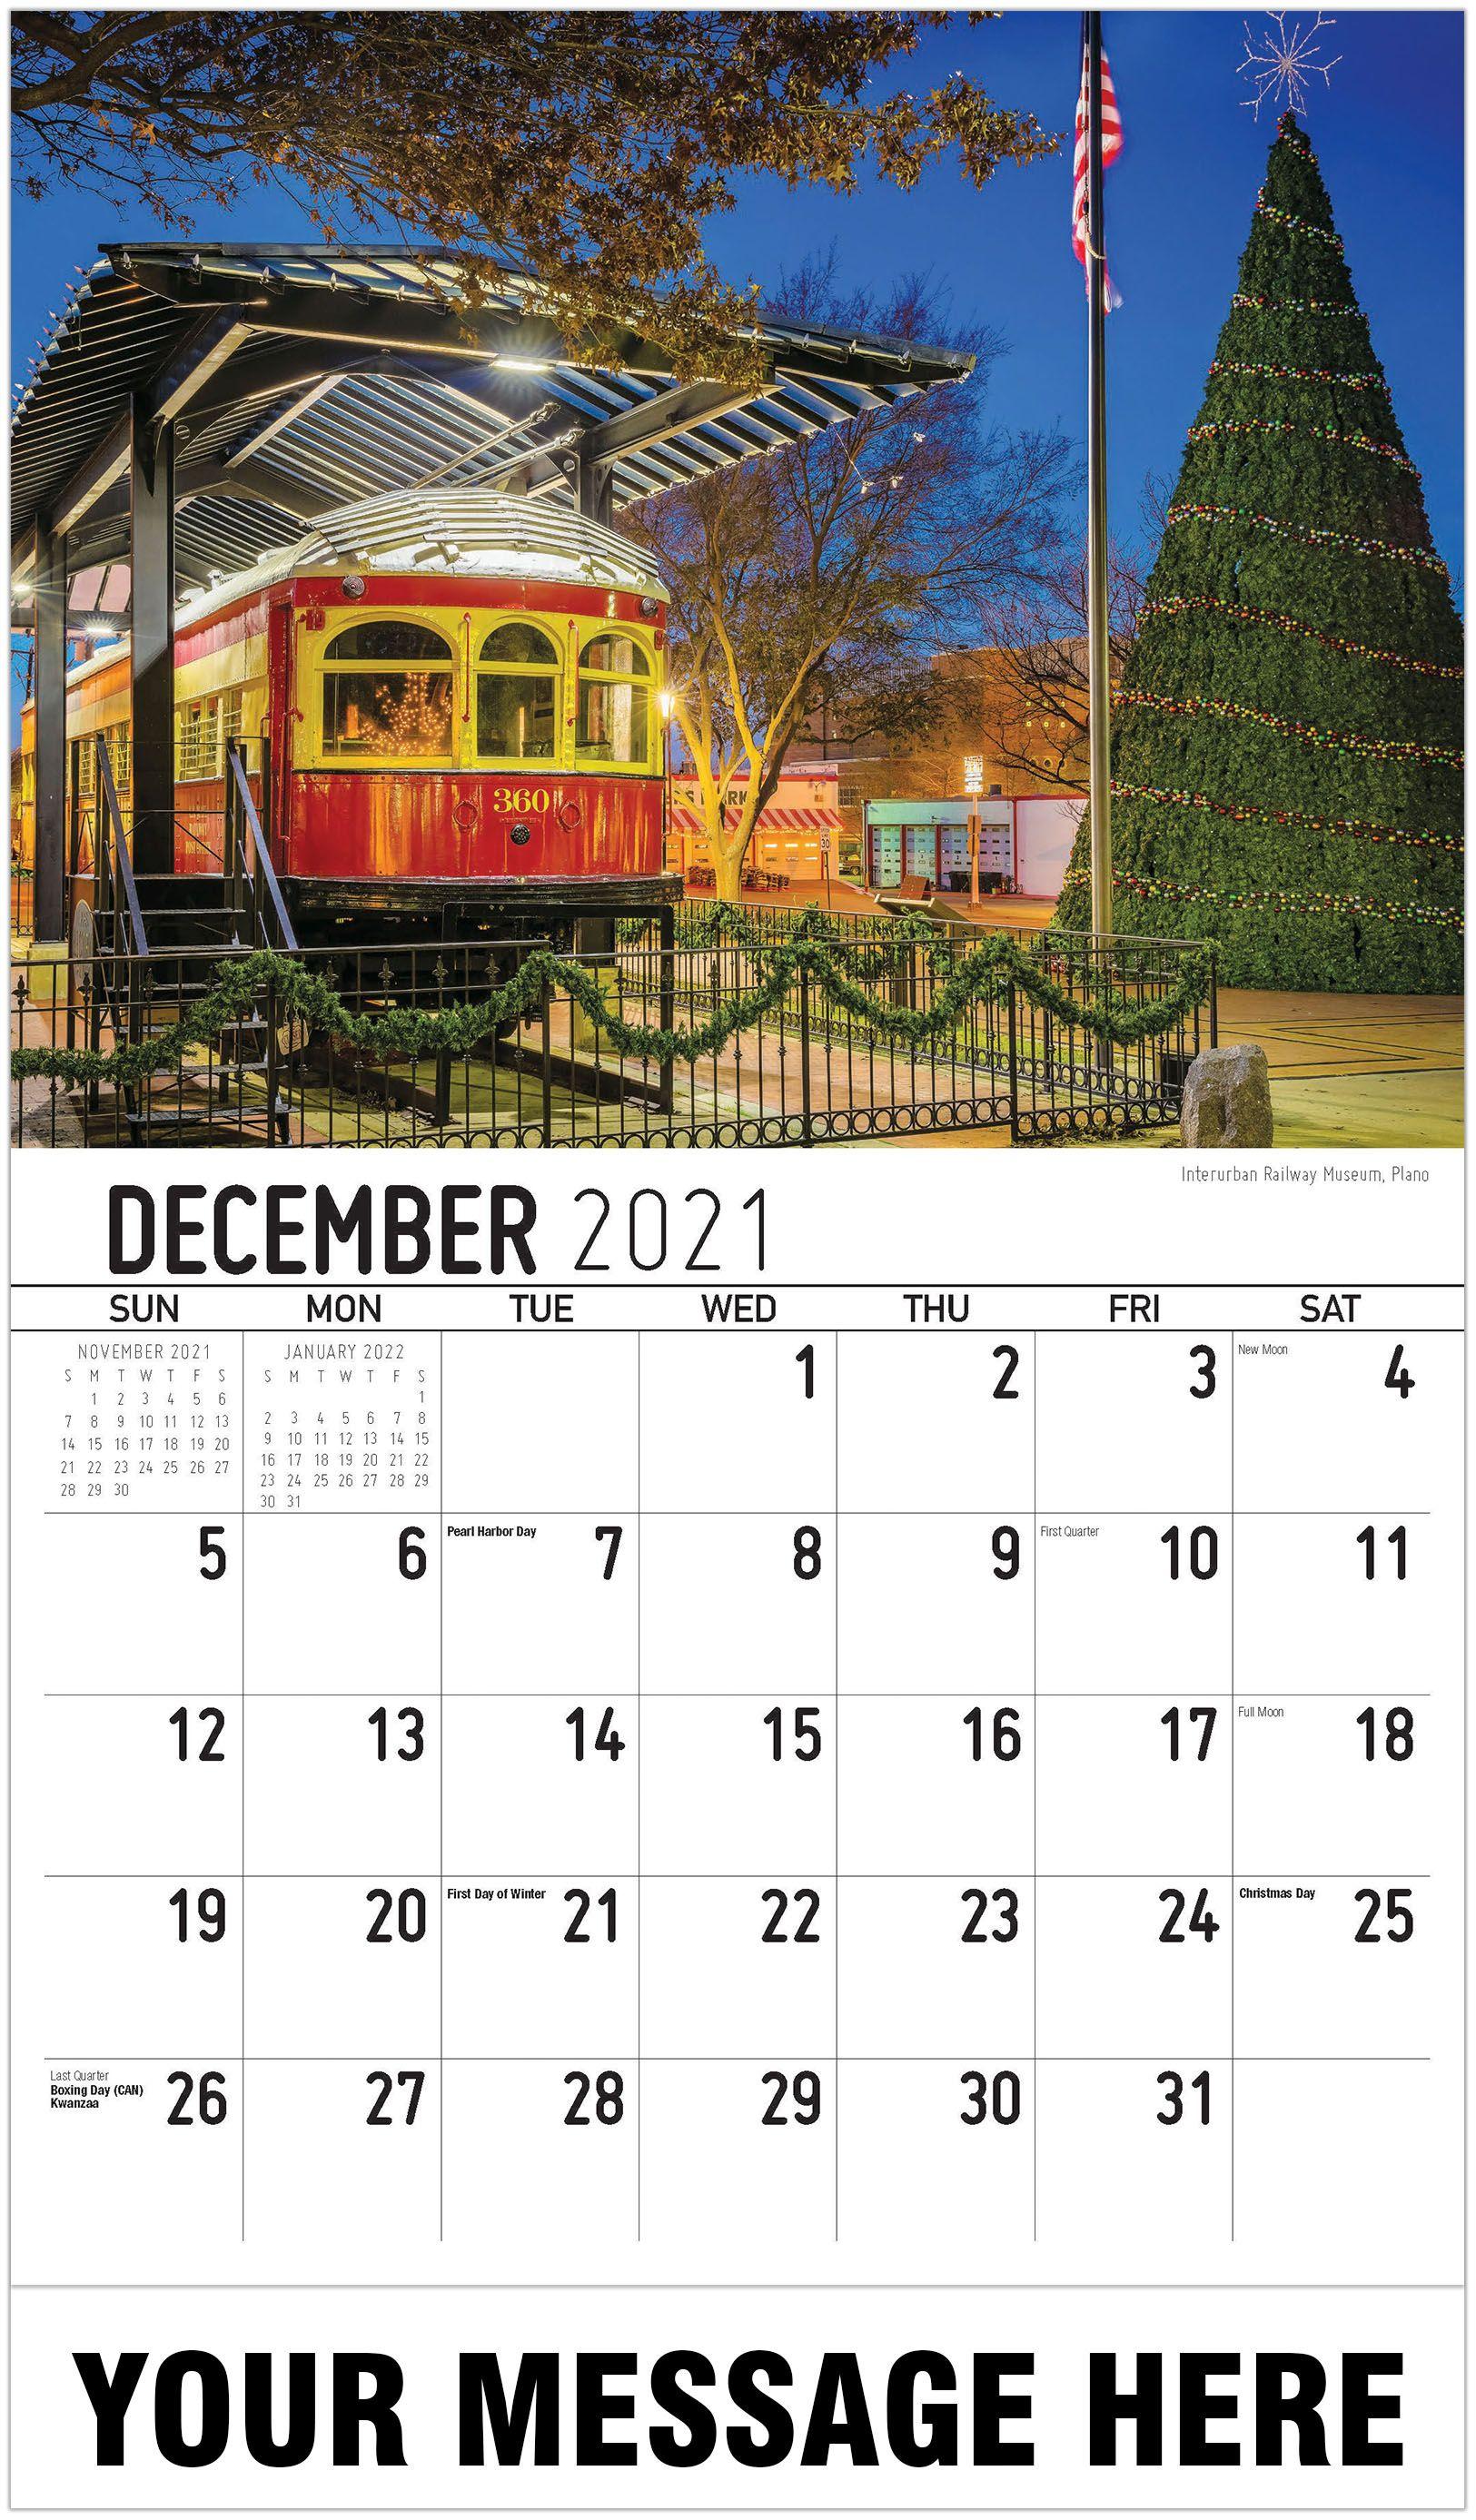 Scenic Texas Calendar December 2021 In 2020 Scenic Historical Sites Event Location